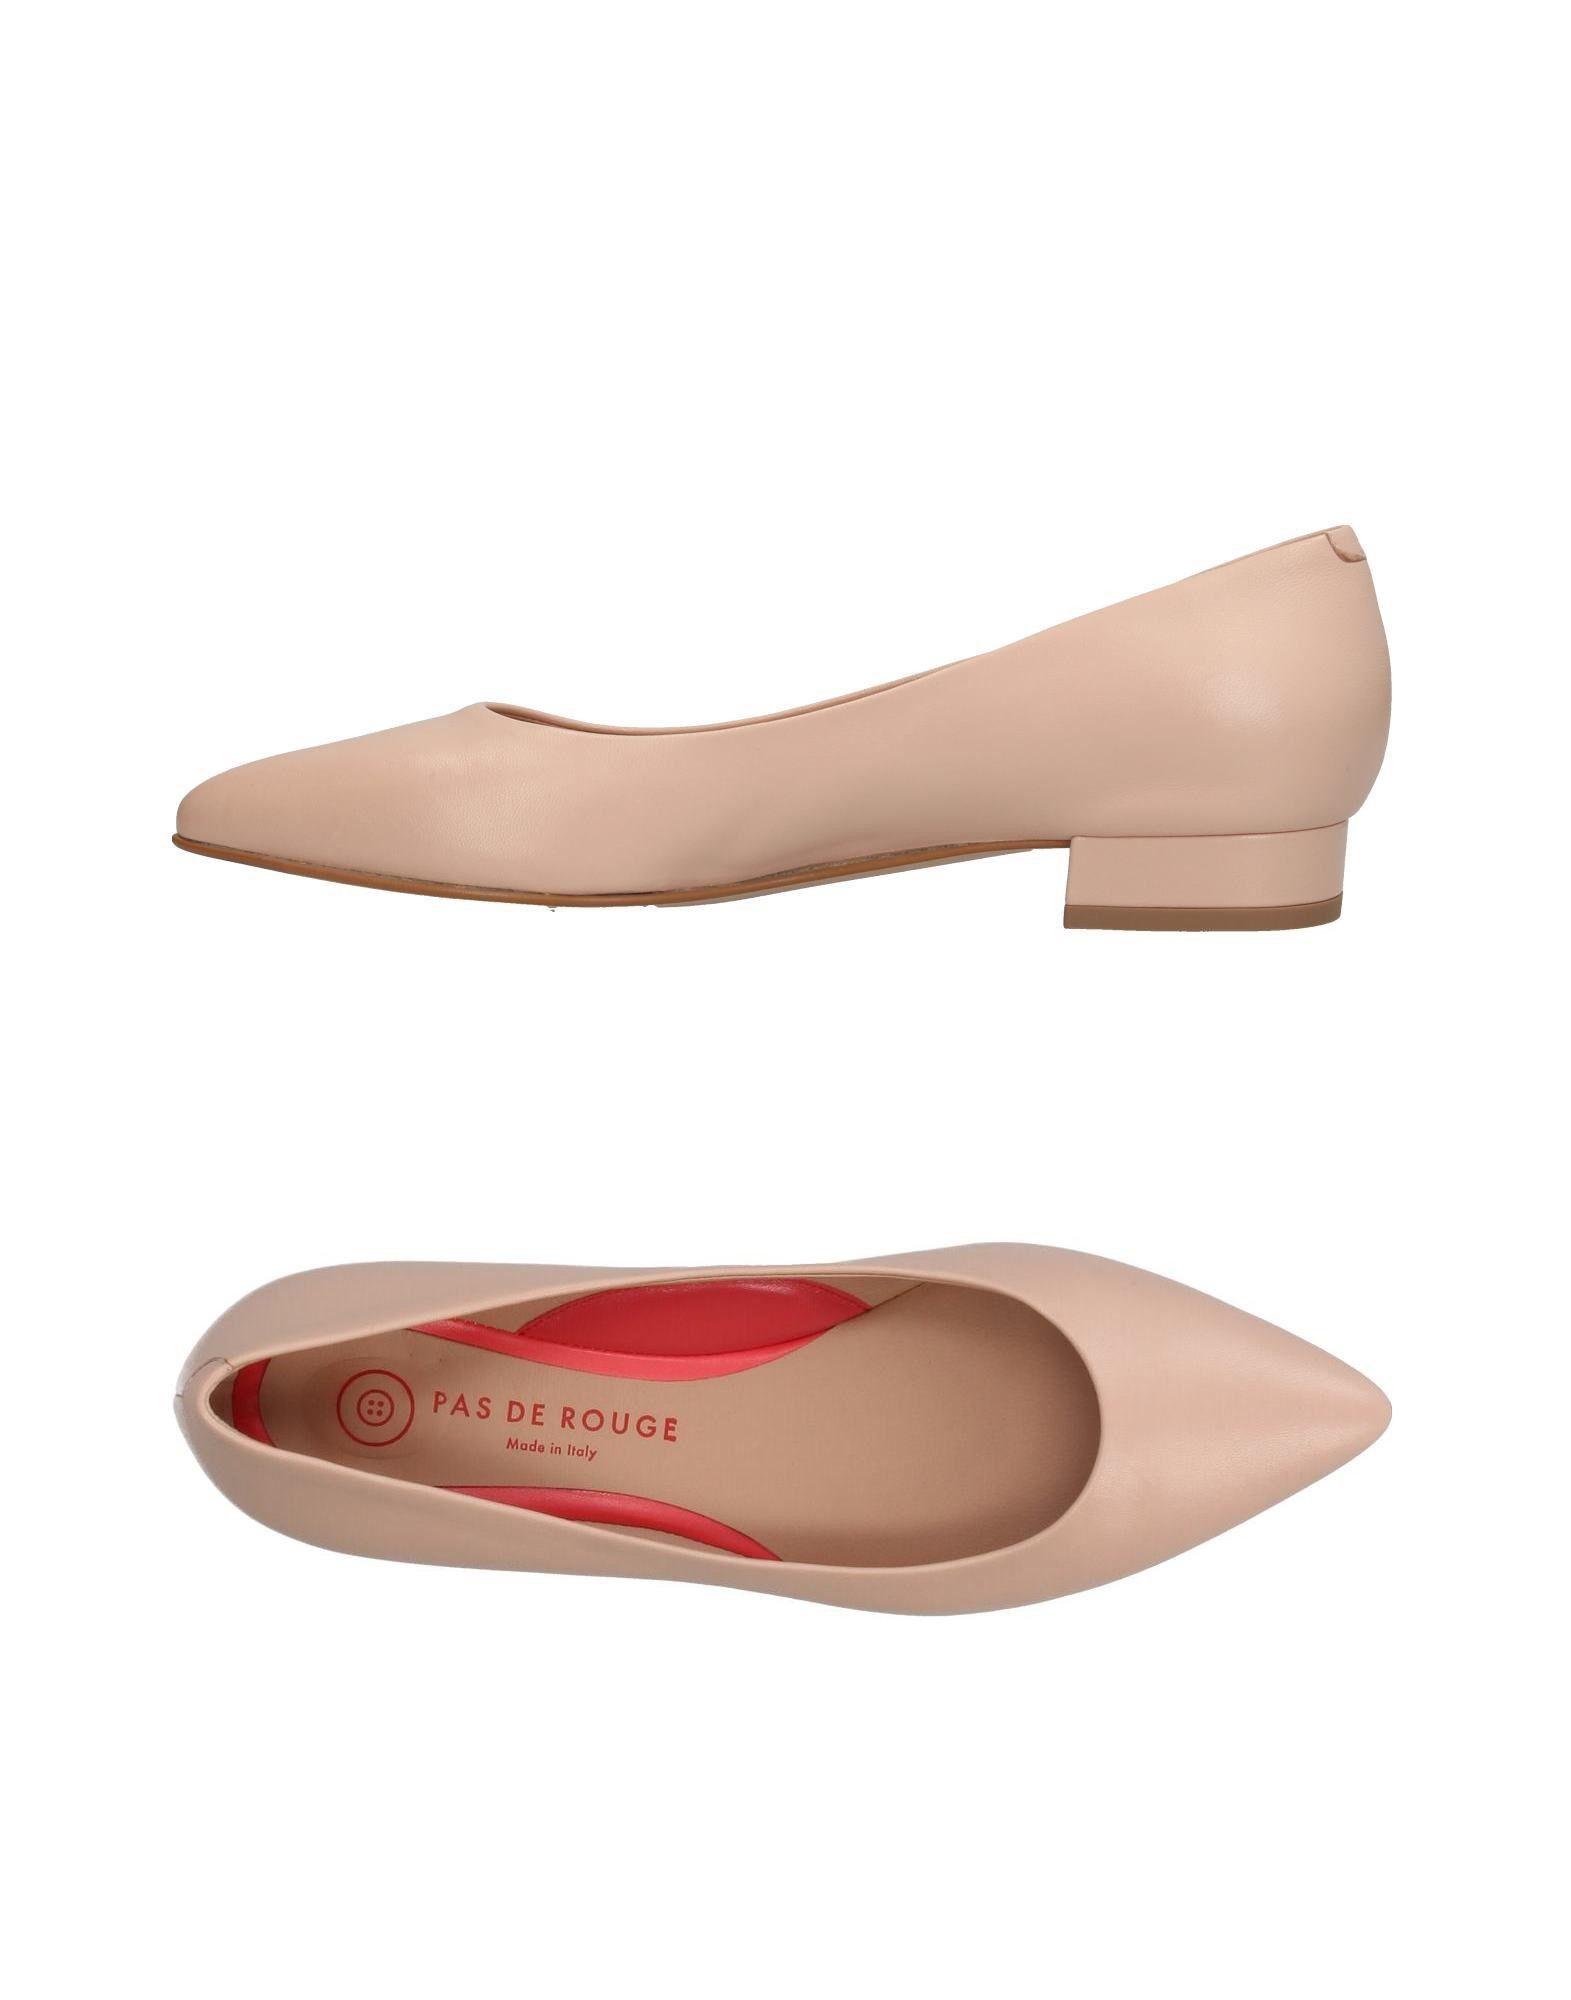 Ballerine Pas De Rouge Donna - Acquista online su